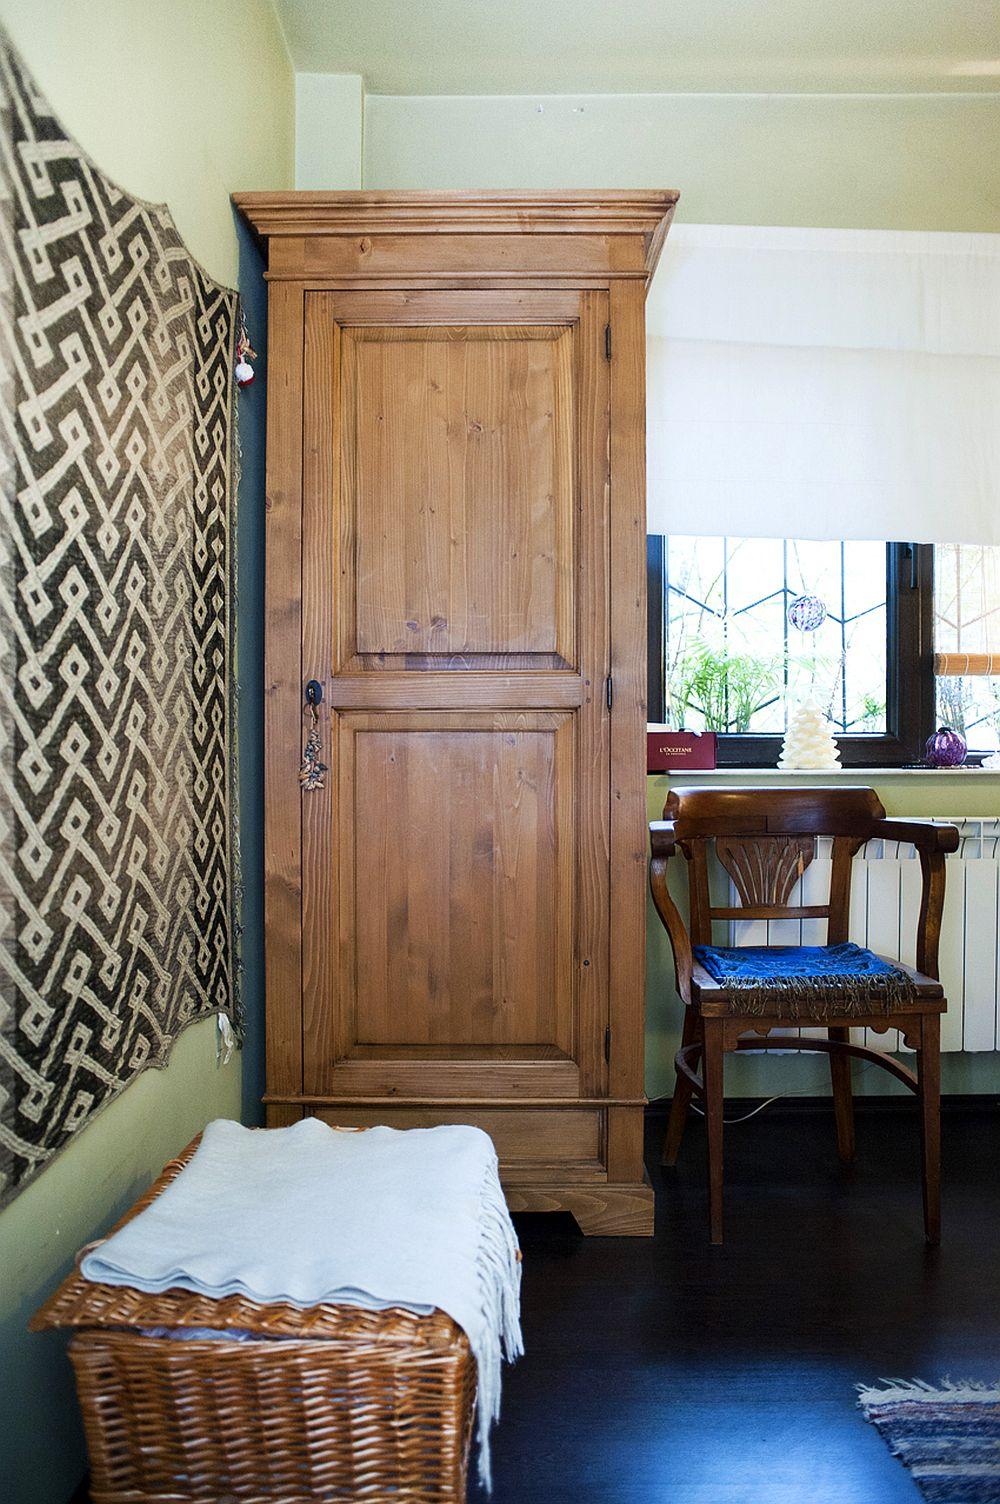 adelaparvu.com despre apartament boem de doua camere Bucuresti, designer Mihaela Poenaru, Foto Dragos Boldea (29)